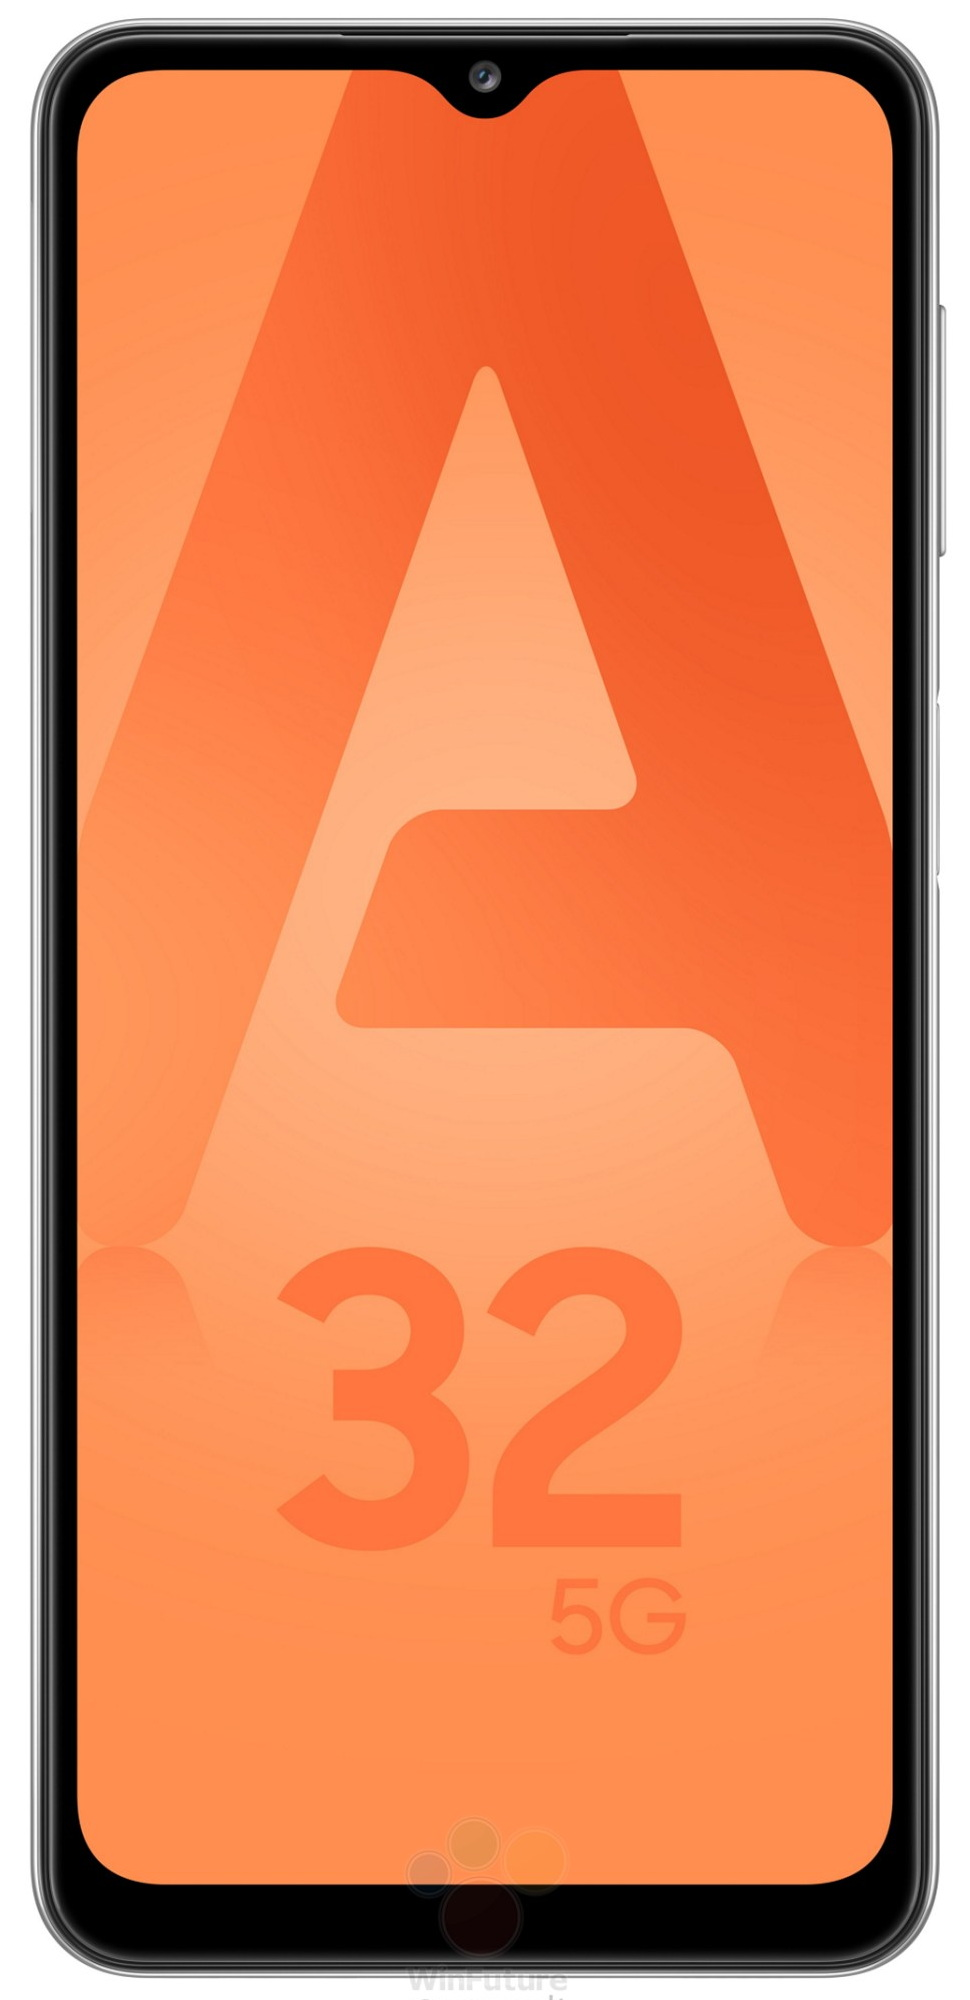 Samsung Galaxy A32: самый доступный смартфон от Samsung с 5G. Фото Samsung  - galaxy_a32_samyj_dostupnyj_samsung_s_5g_bez_bloka_pod_kameru_na_foto_1